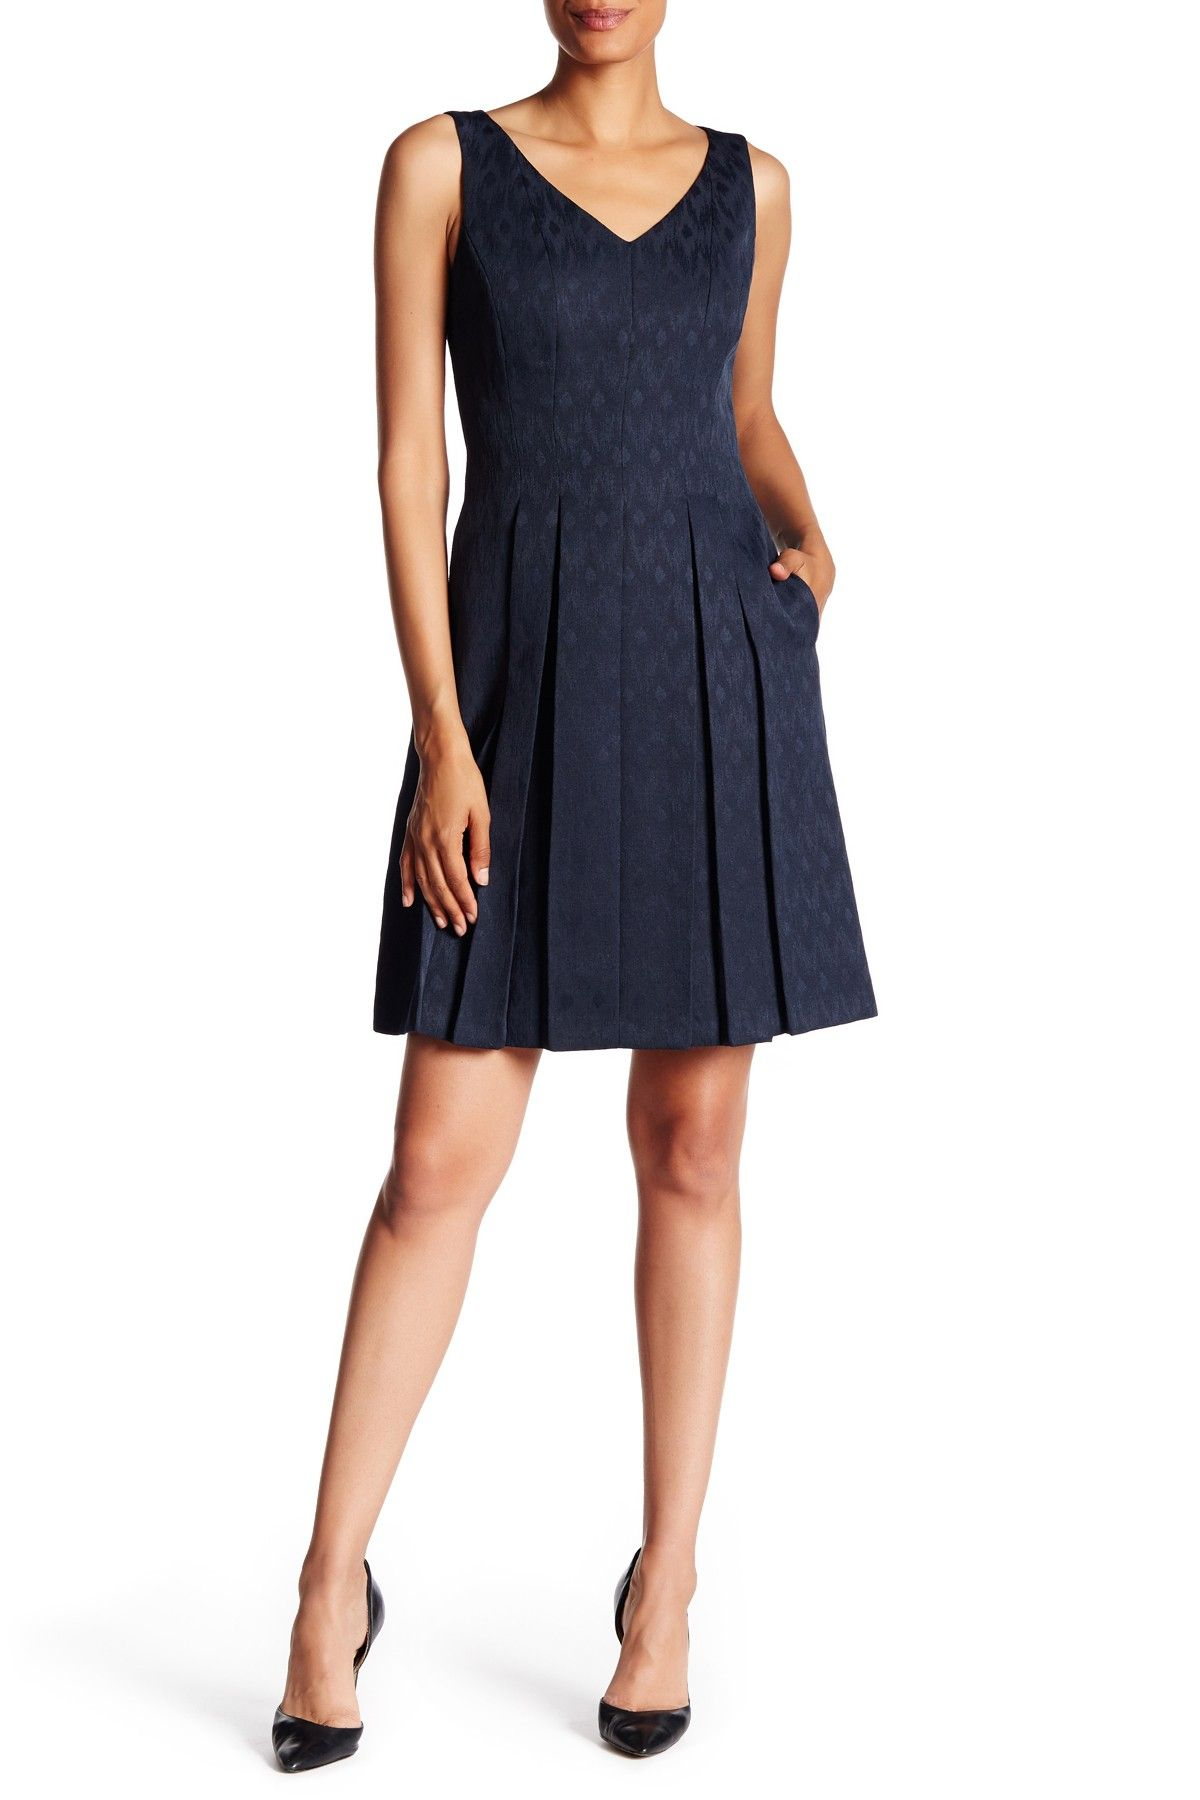 On Hautelook Tahari Jacquard Box Pleat A Line Dress A Line Dress Dresses Clothes Design [ 1800 x 1200 Pixel ]